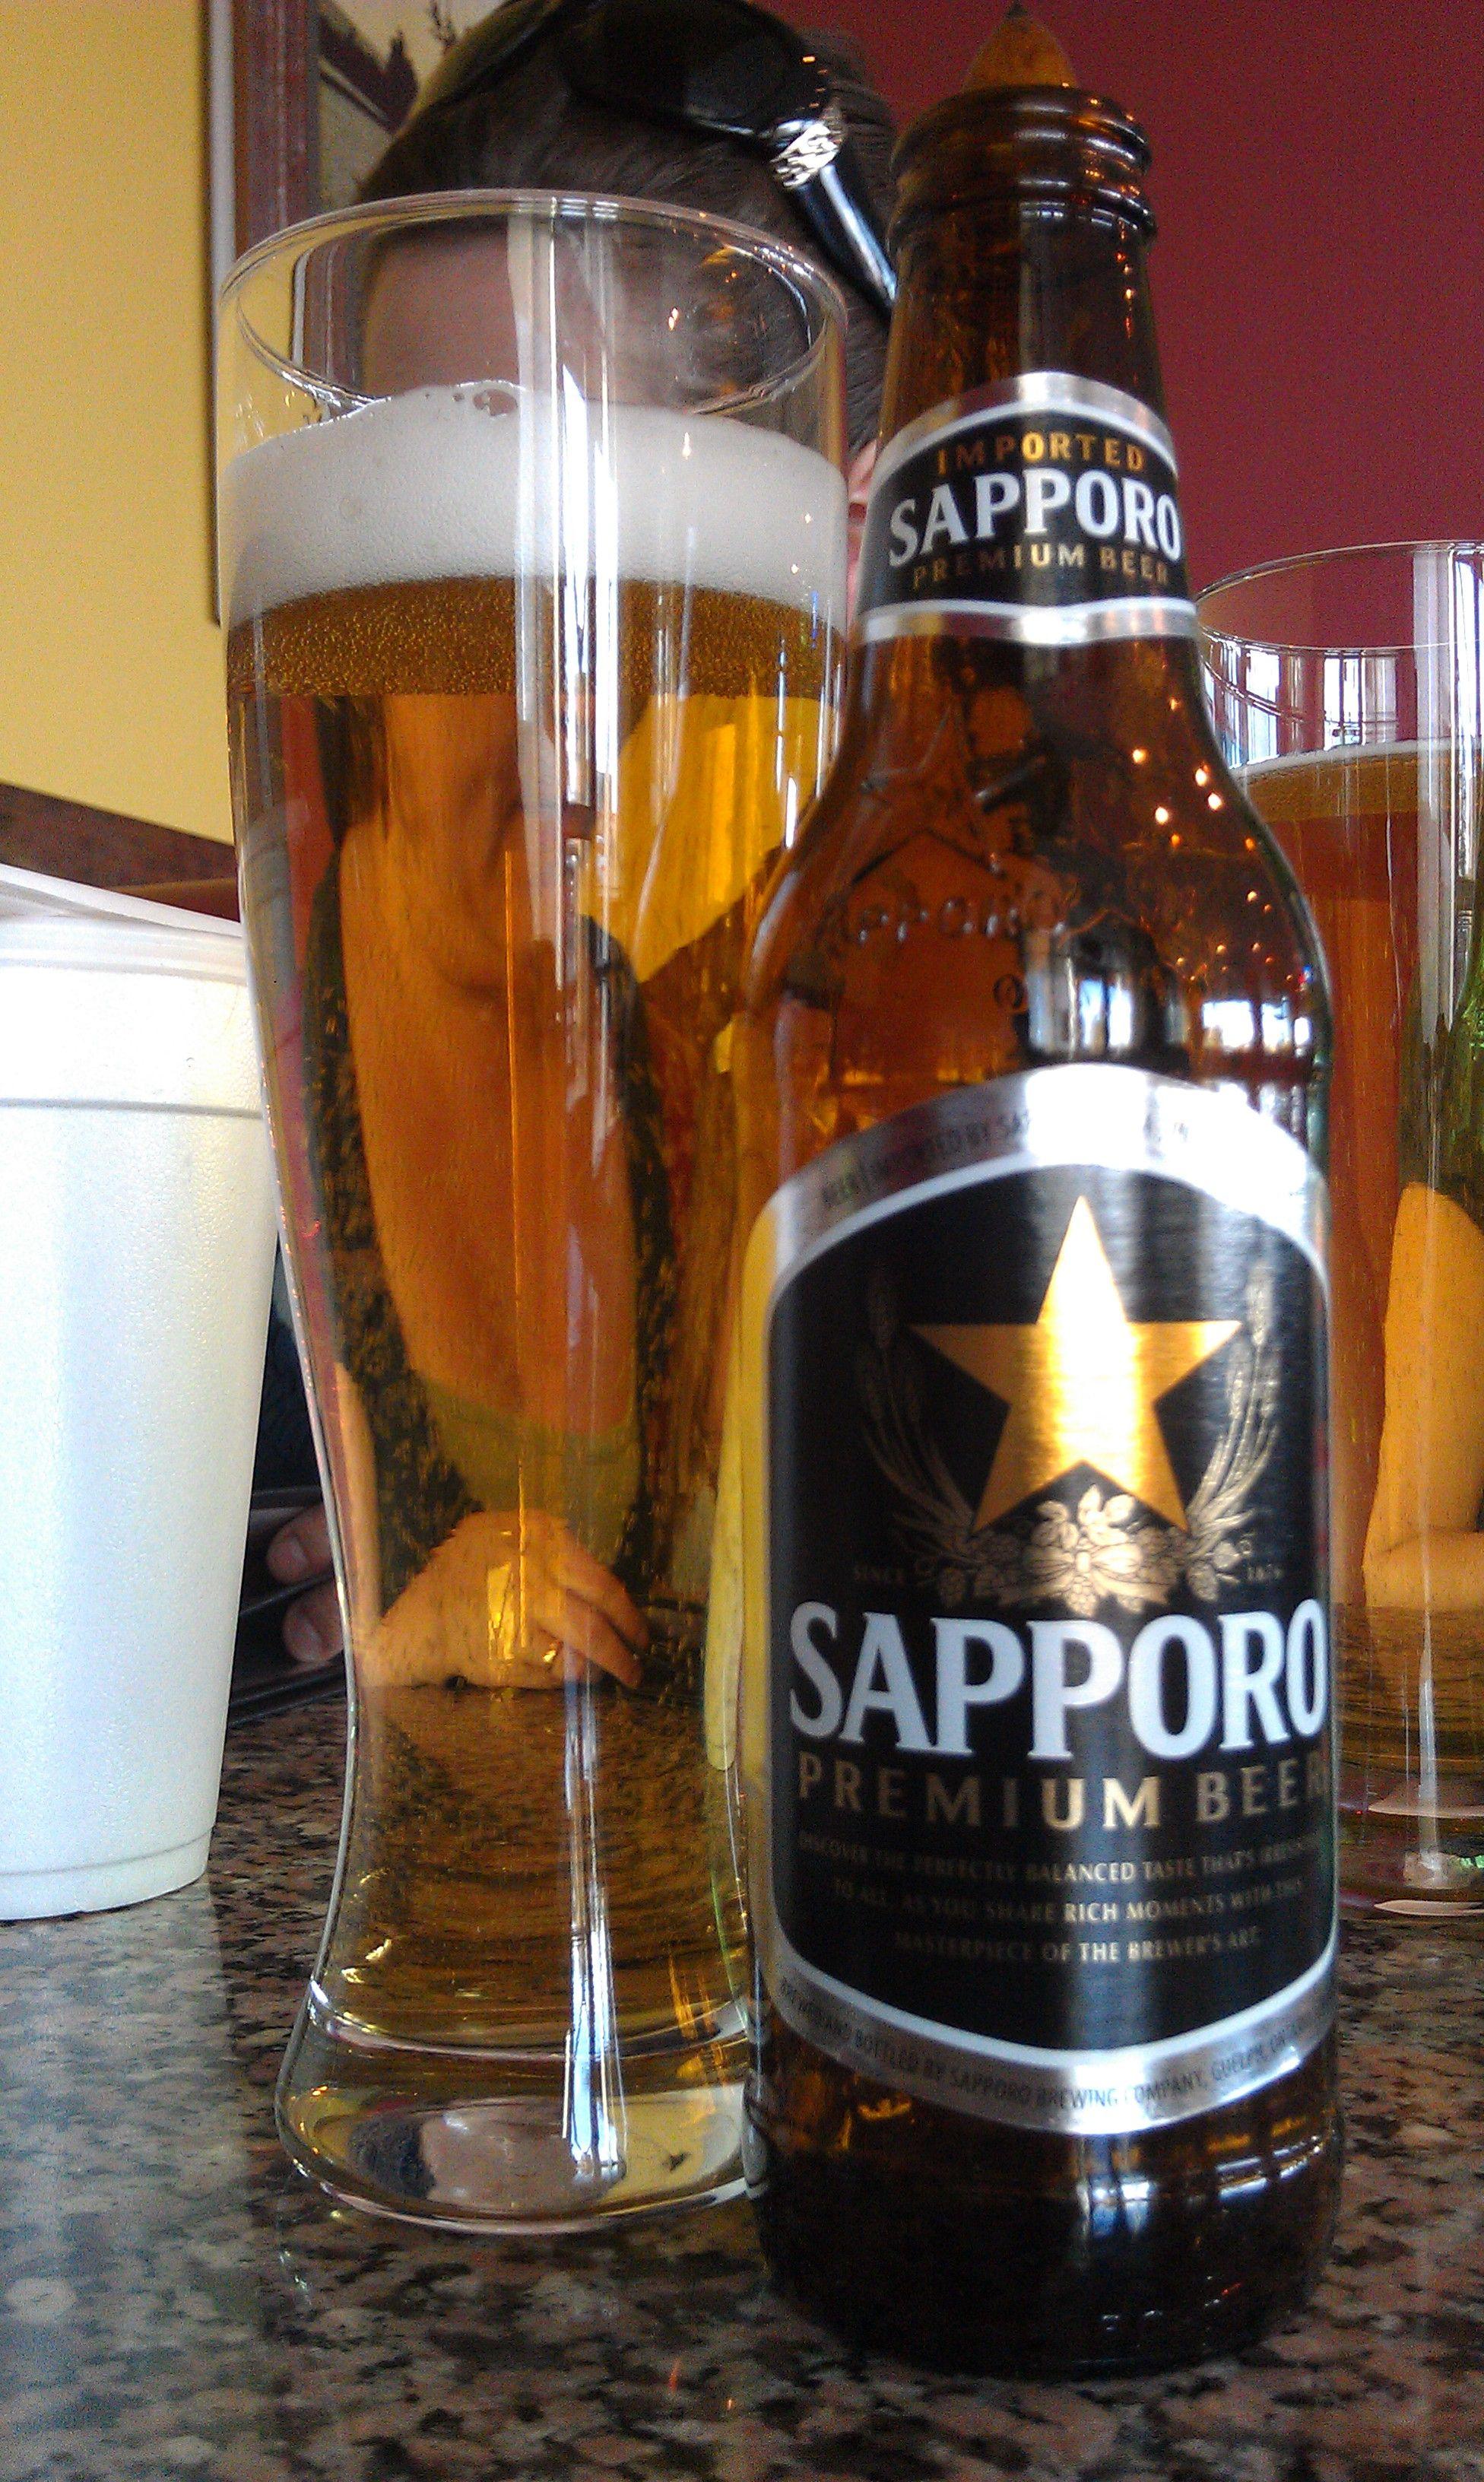 67  poor - Sapporo Premium Beer - Sapporo Breweries http://www.beeradvocate.com/beer/profile/284/10071/